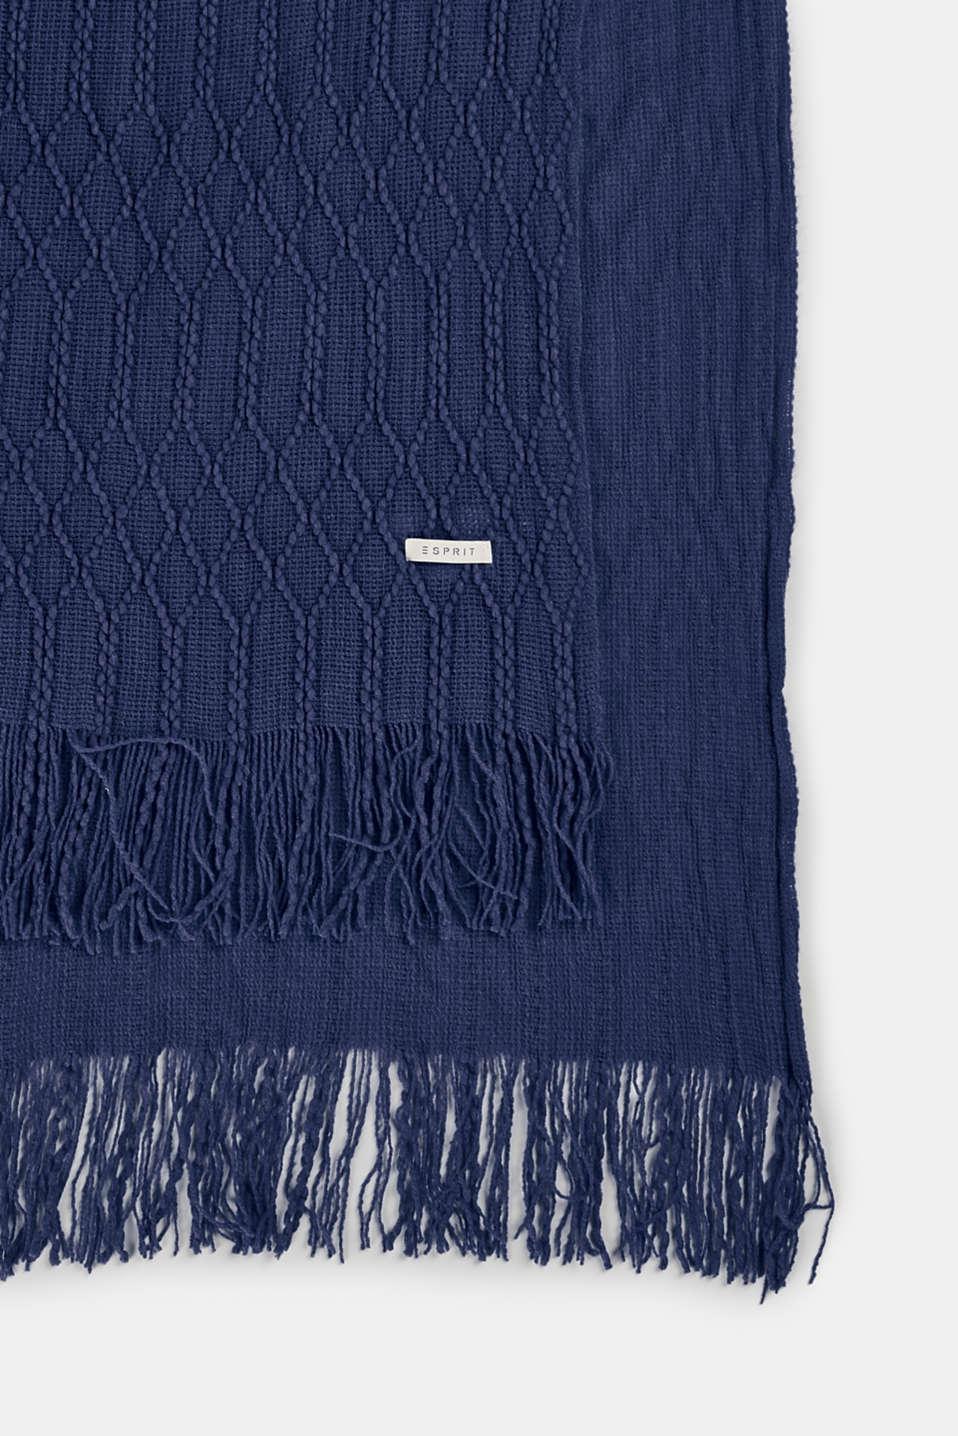 esprit gewebtes plaid mit waben muster im online shop kaufen. Black Bedroom Furniture Sets. Home Design Ideas